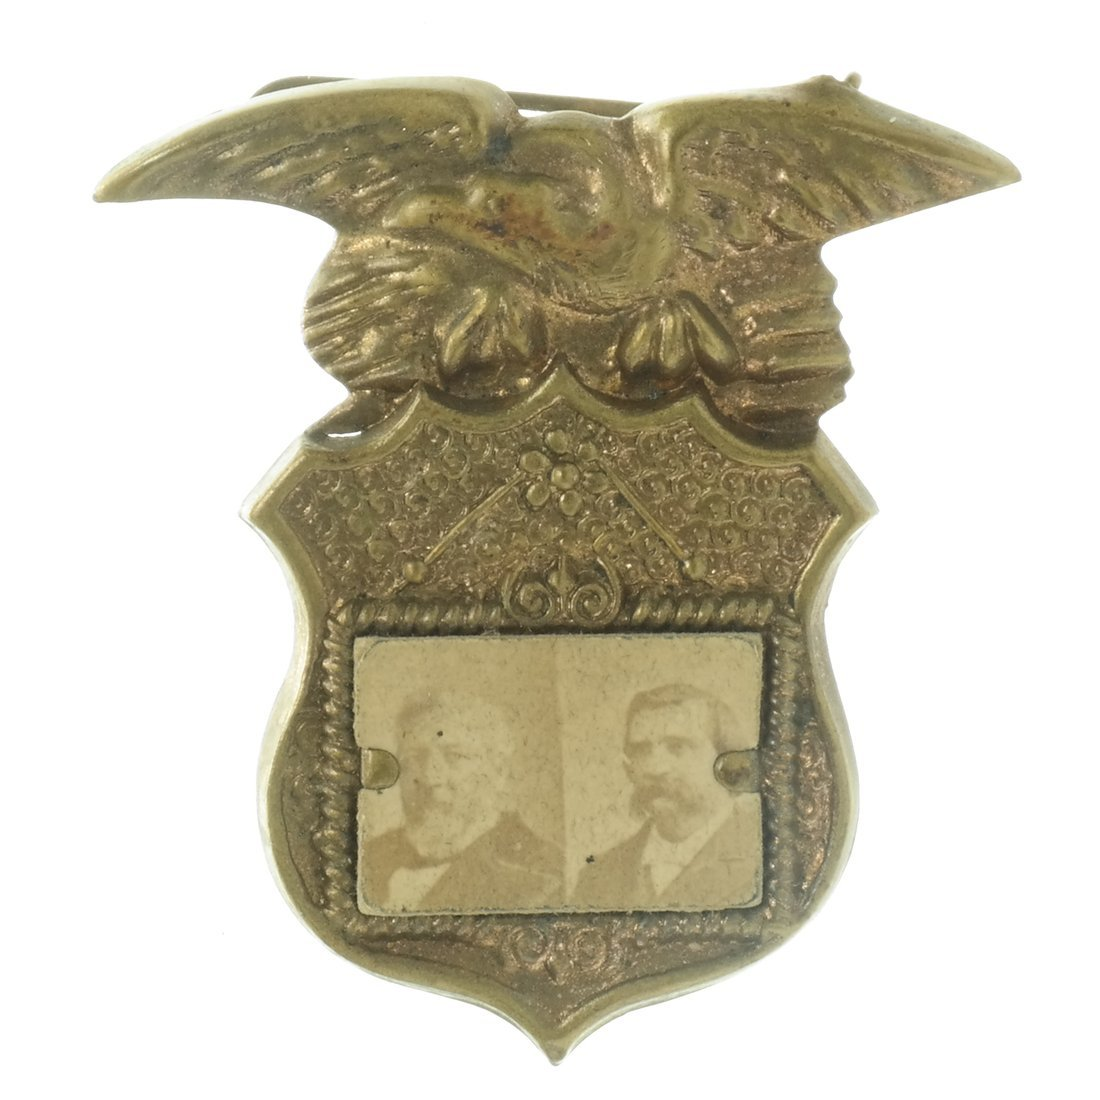 Blaine & Logan Two 1884 Jugate Shell Badges - 3